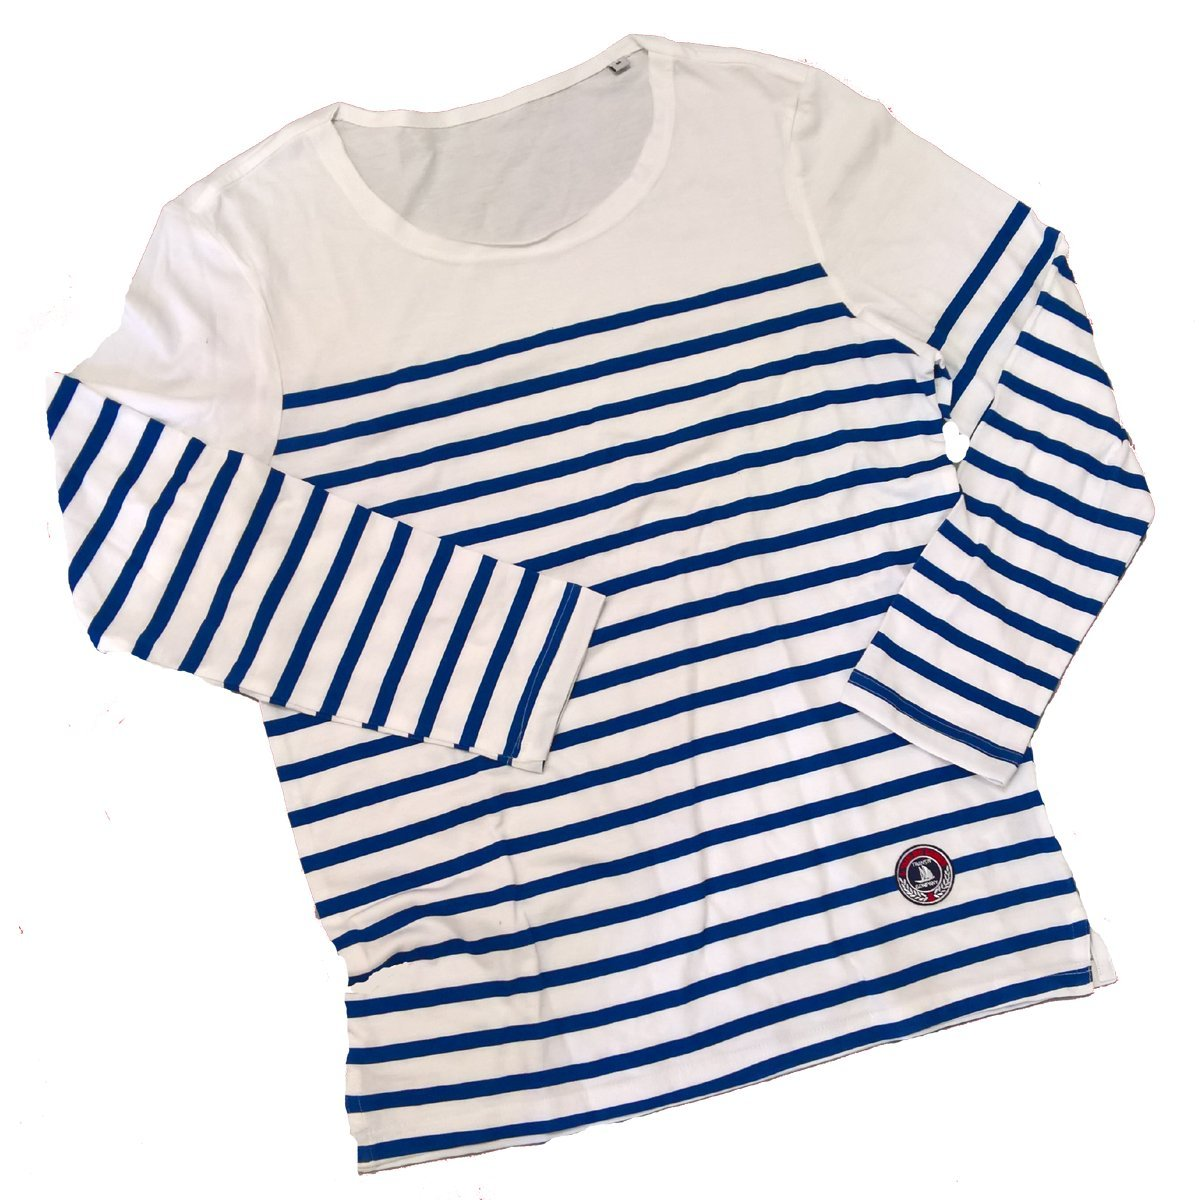 Col Bord Franc Grungy Taille Rayures Bleu Roy VIA PRINT Marini/ére enfant Bulle Manches Longues 10 Ans